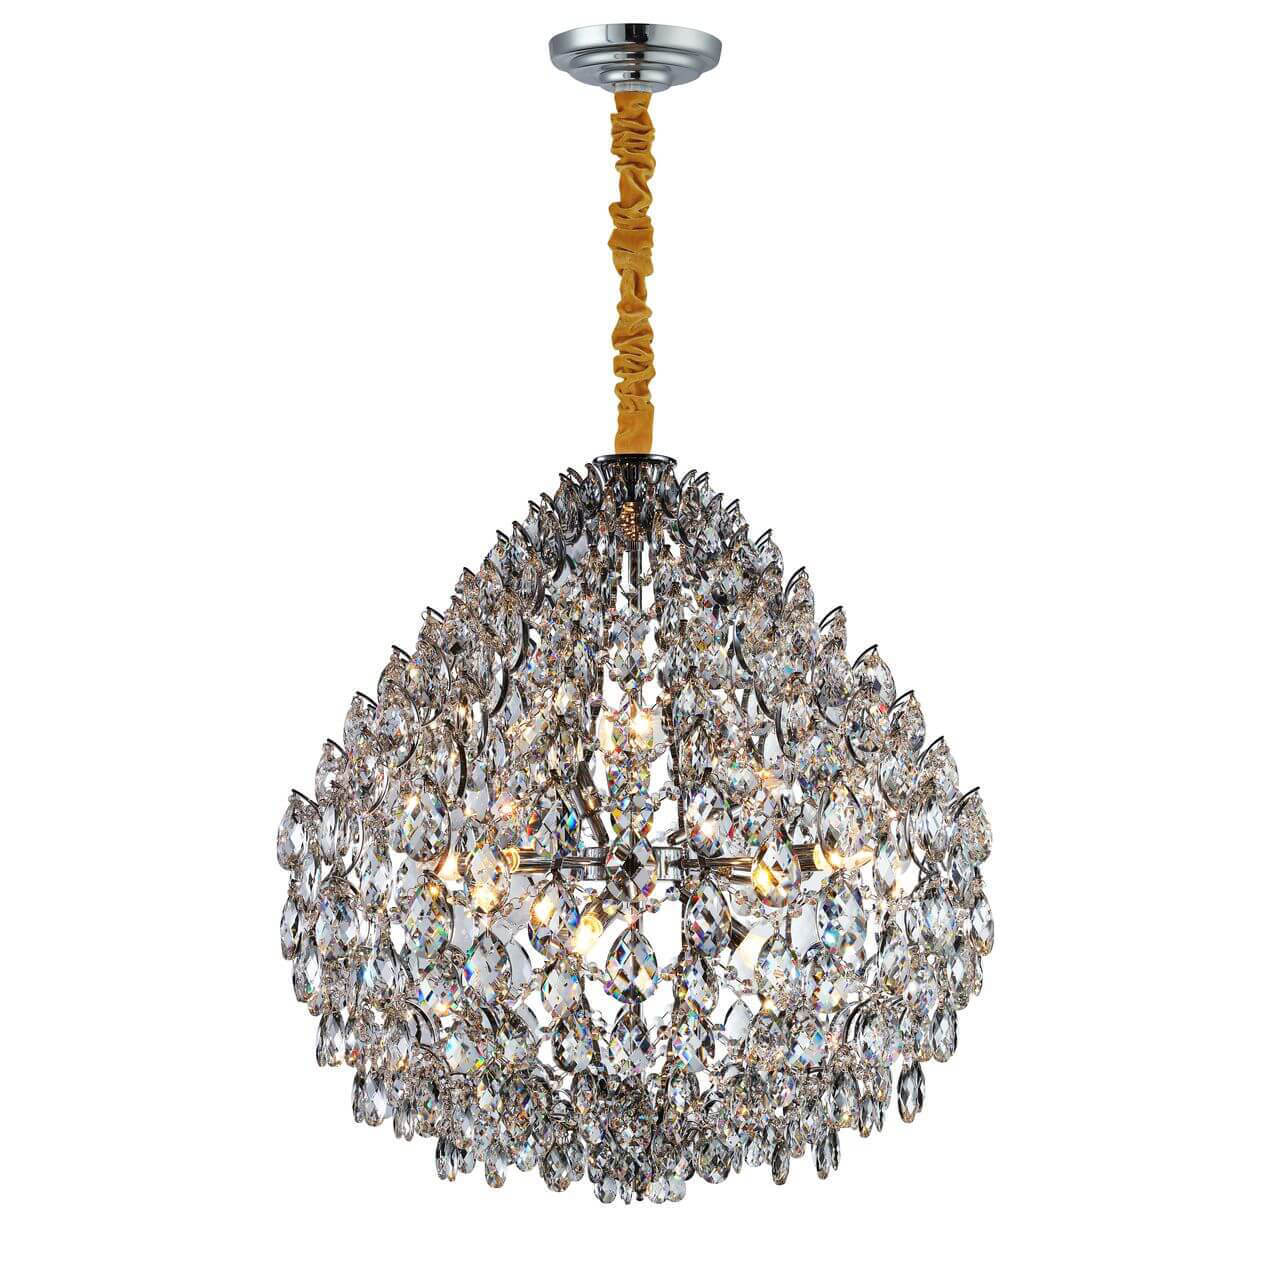 все цены на Подвесная люстра Favourite Faberge 2093-10P онлайн